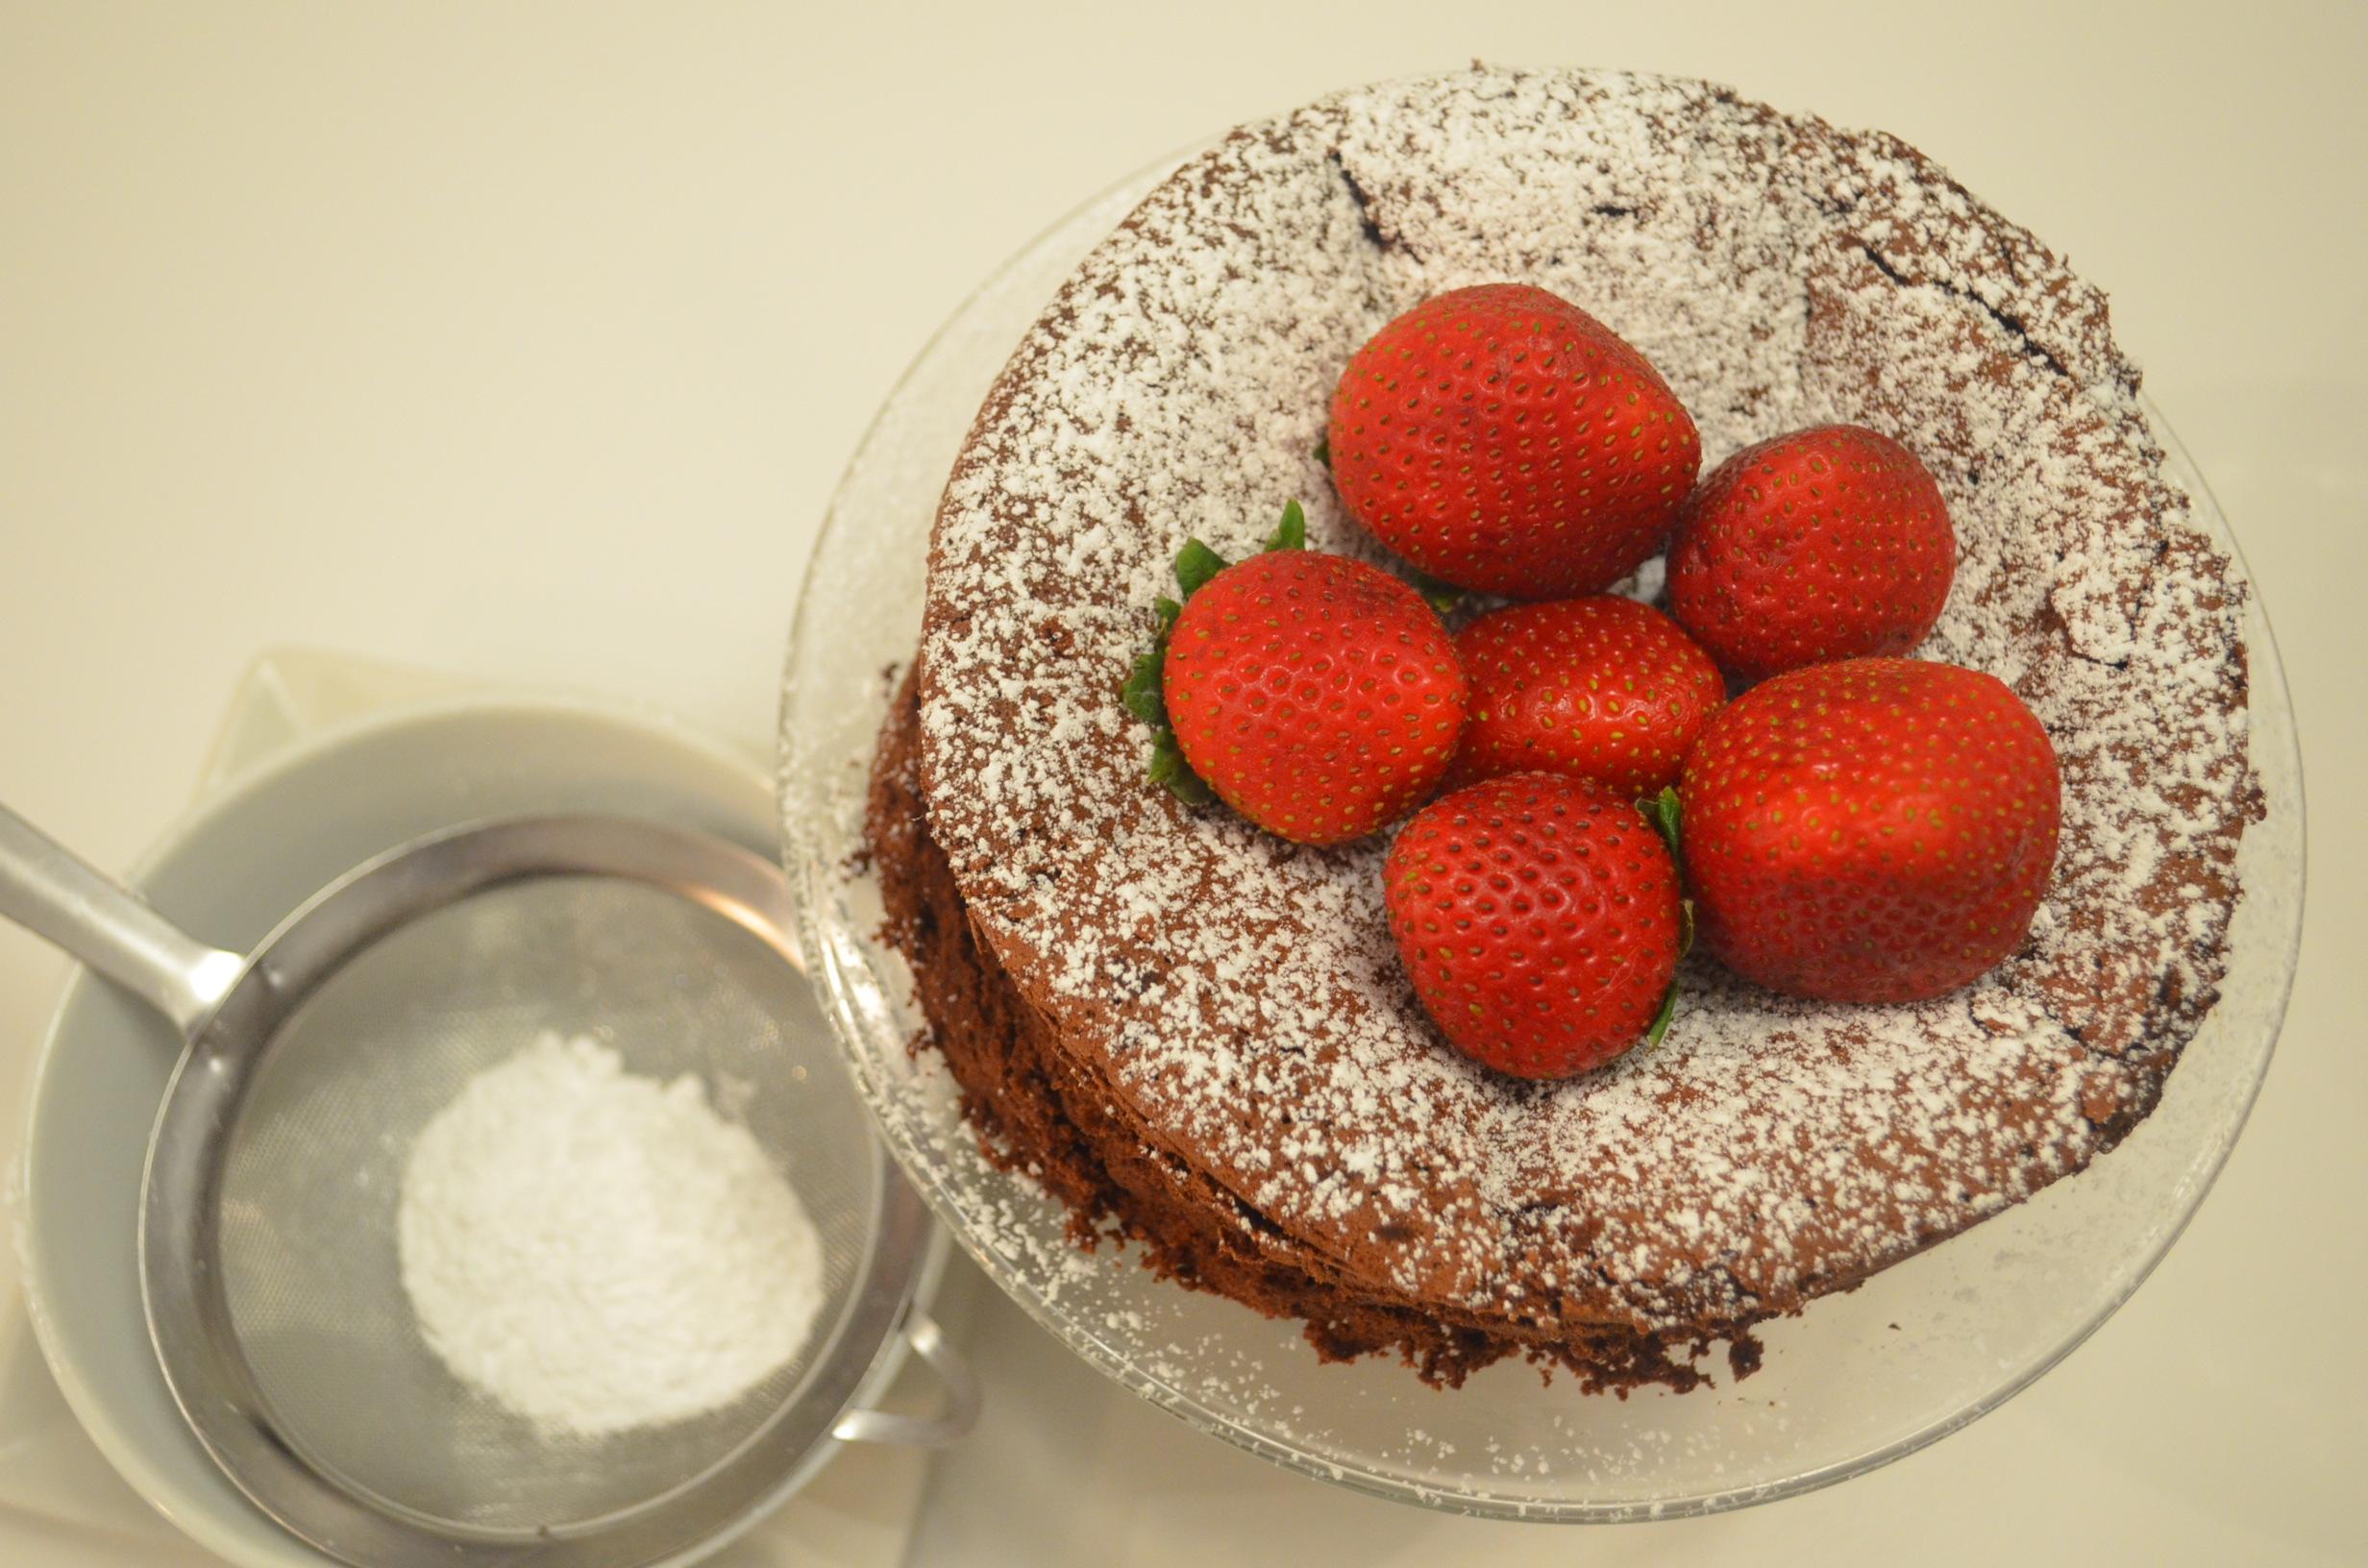 Chocolate cake recipe 4 ingredients